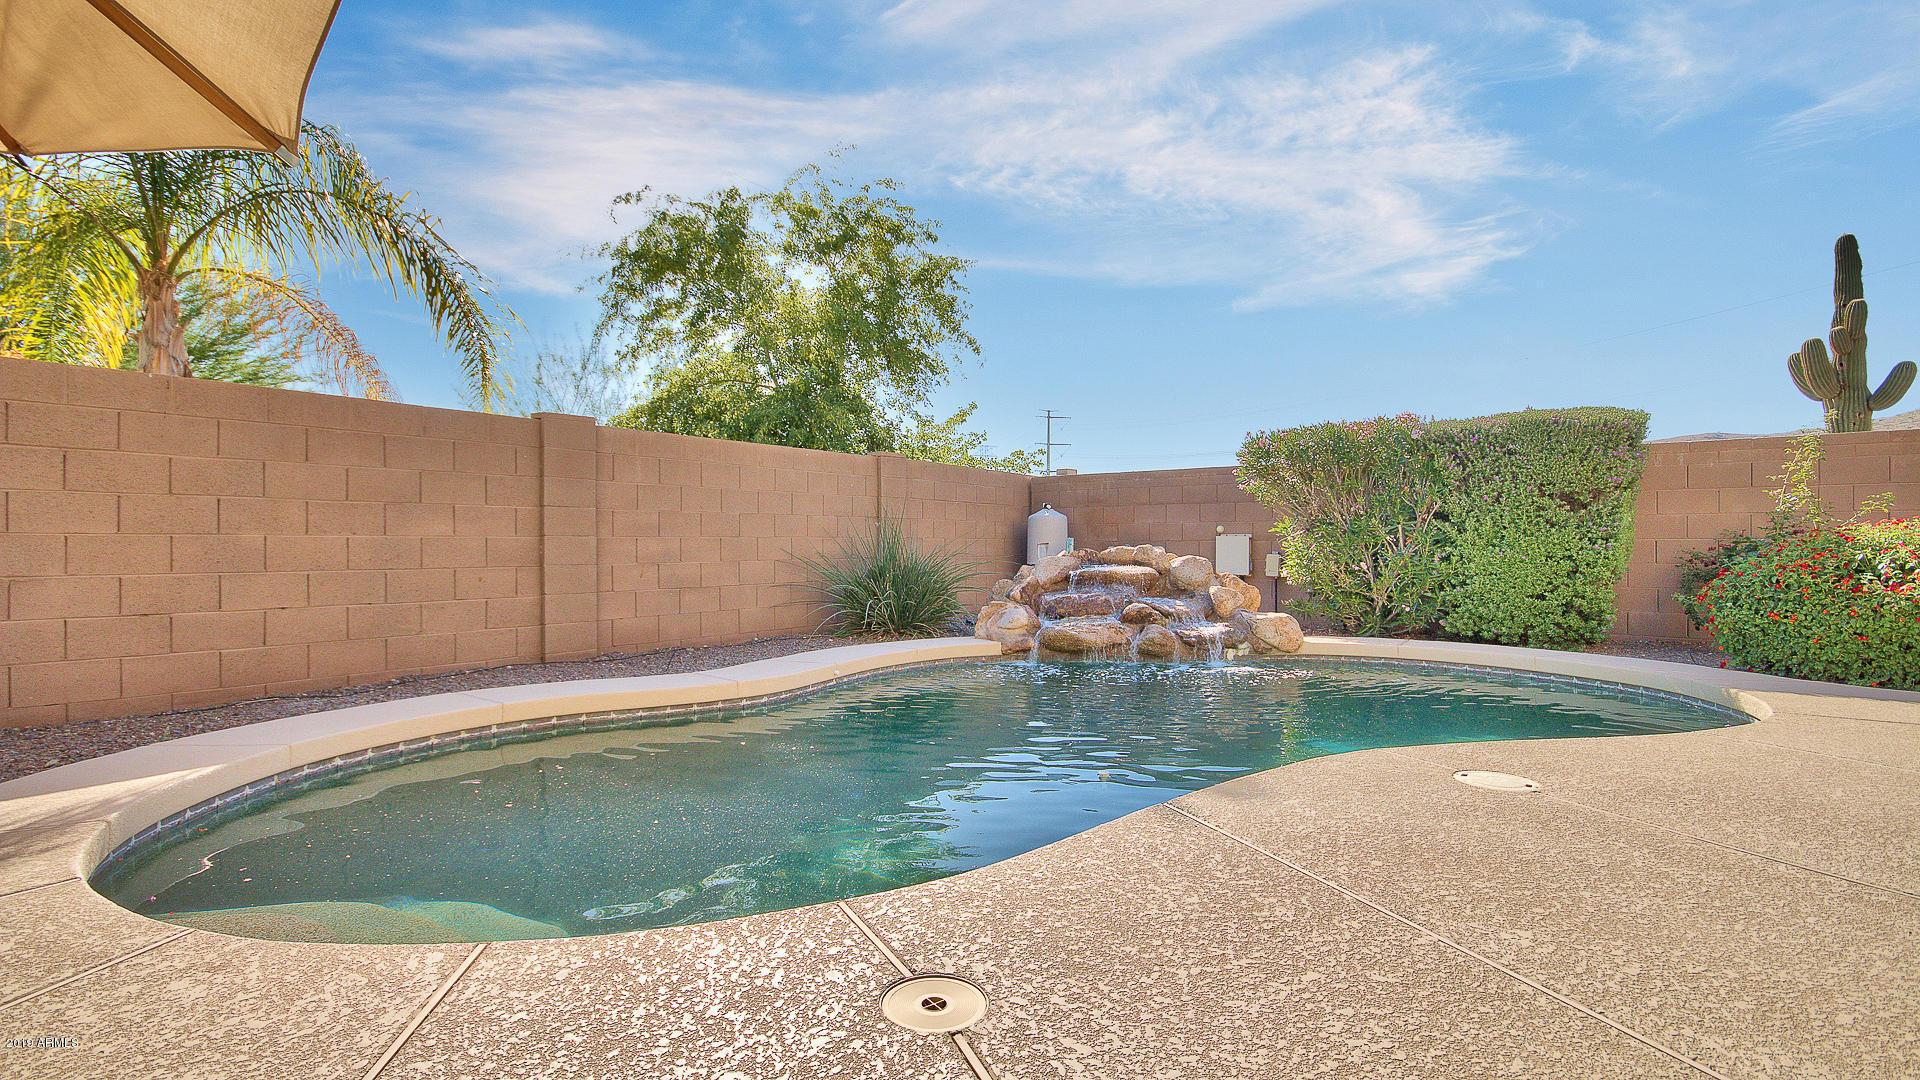 MLS 5936310 2405 E RUSTLING OAKS Lane, Phoenix, AZ 85024 Phoenix AZ Desert Peak